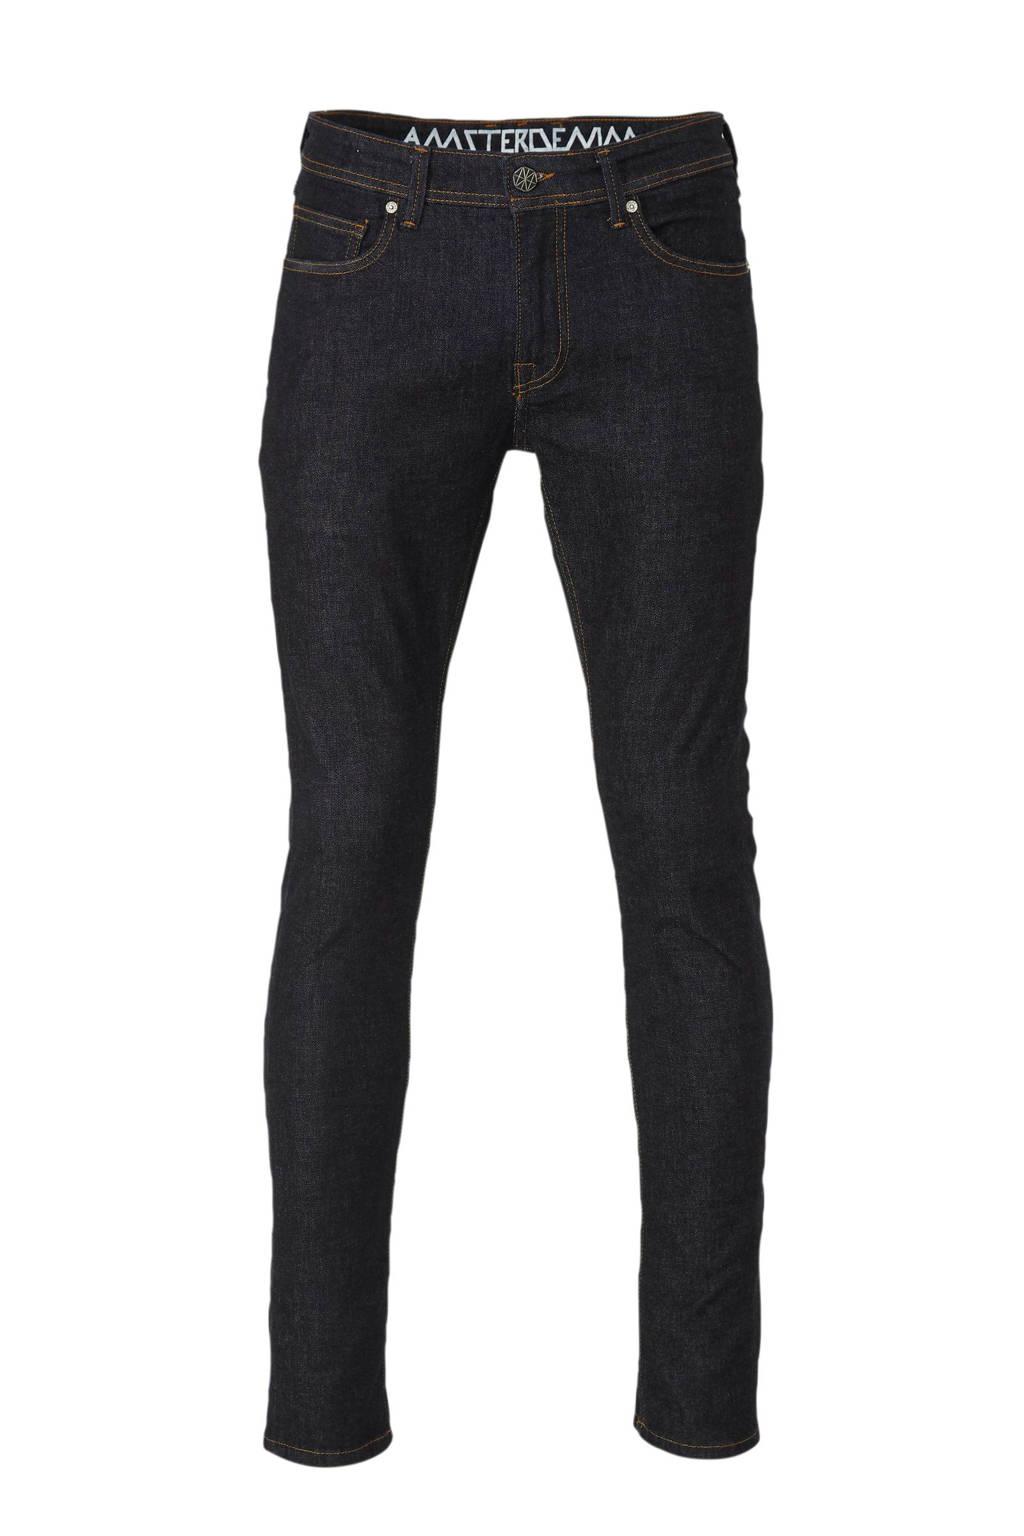 Amsterdenim straight fit jeans Jan, Rauw Blauw